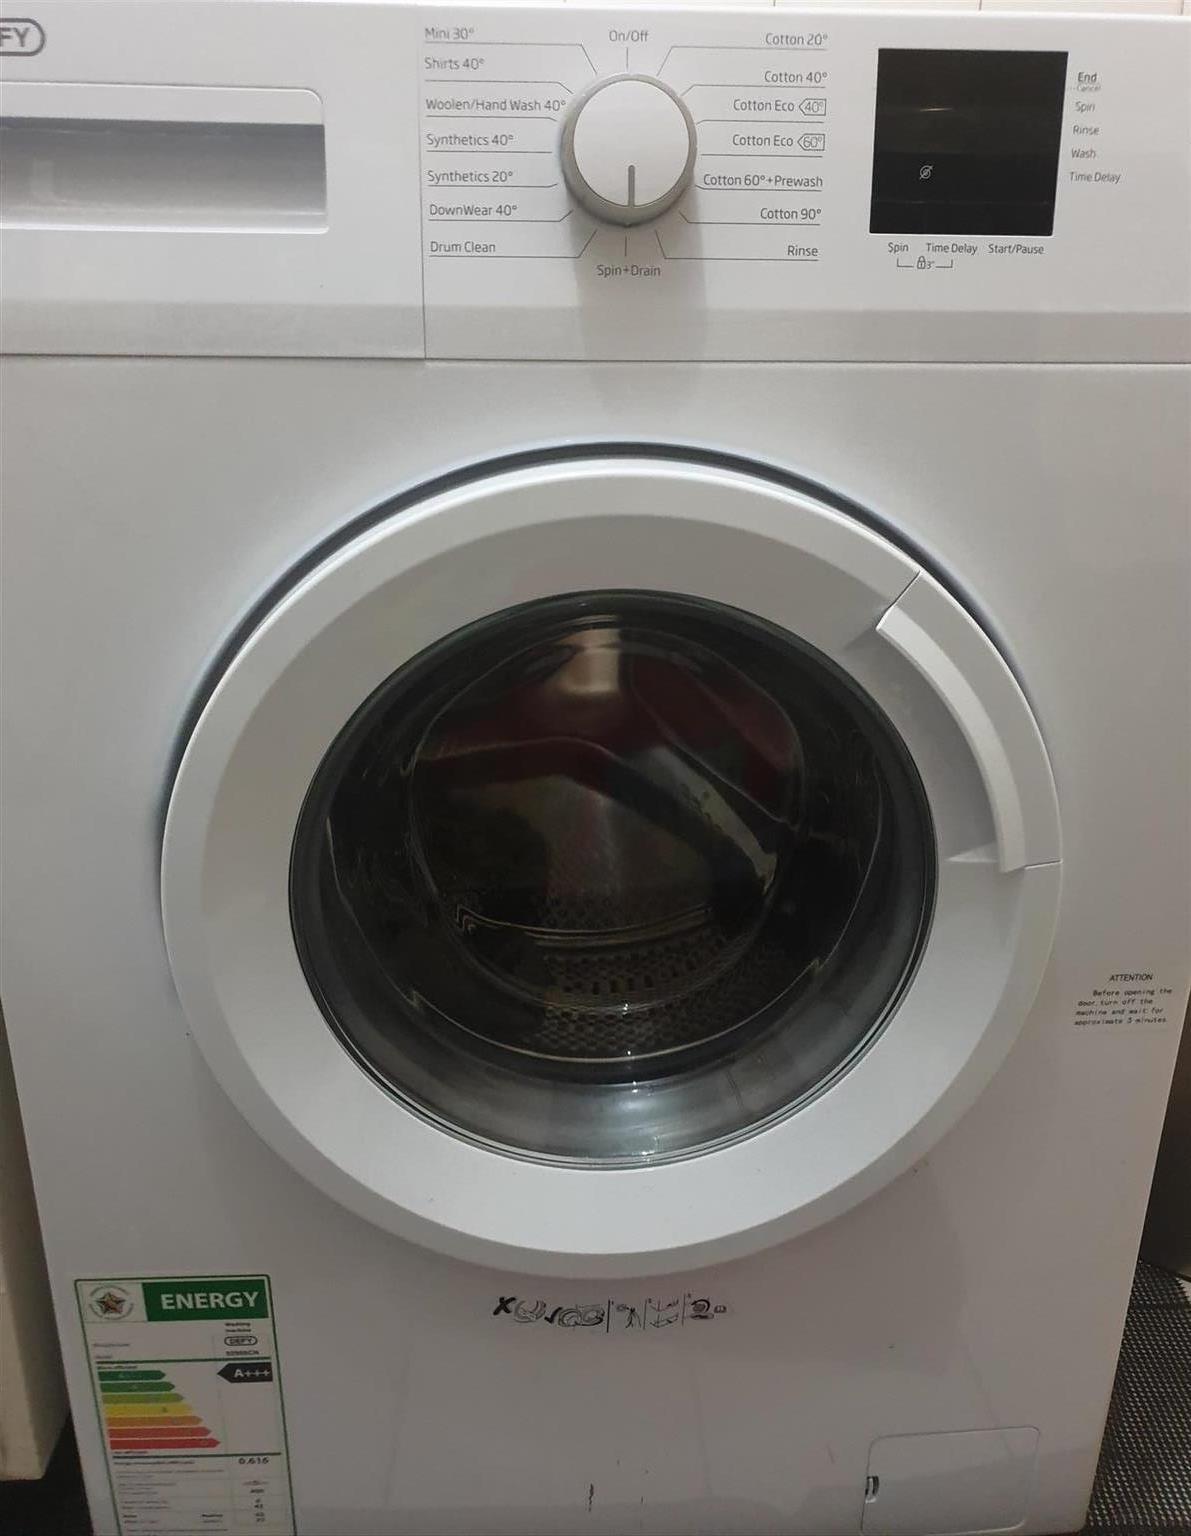 6kg Defy Washing Machine